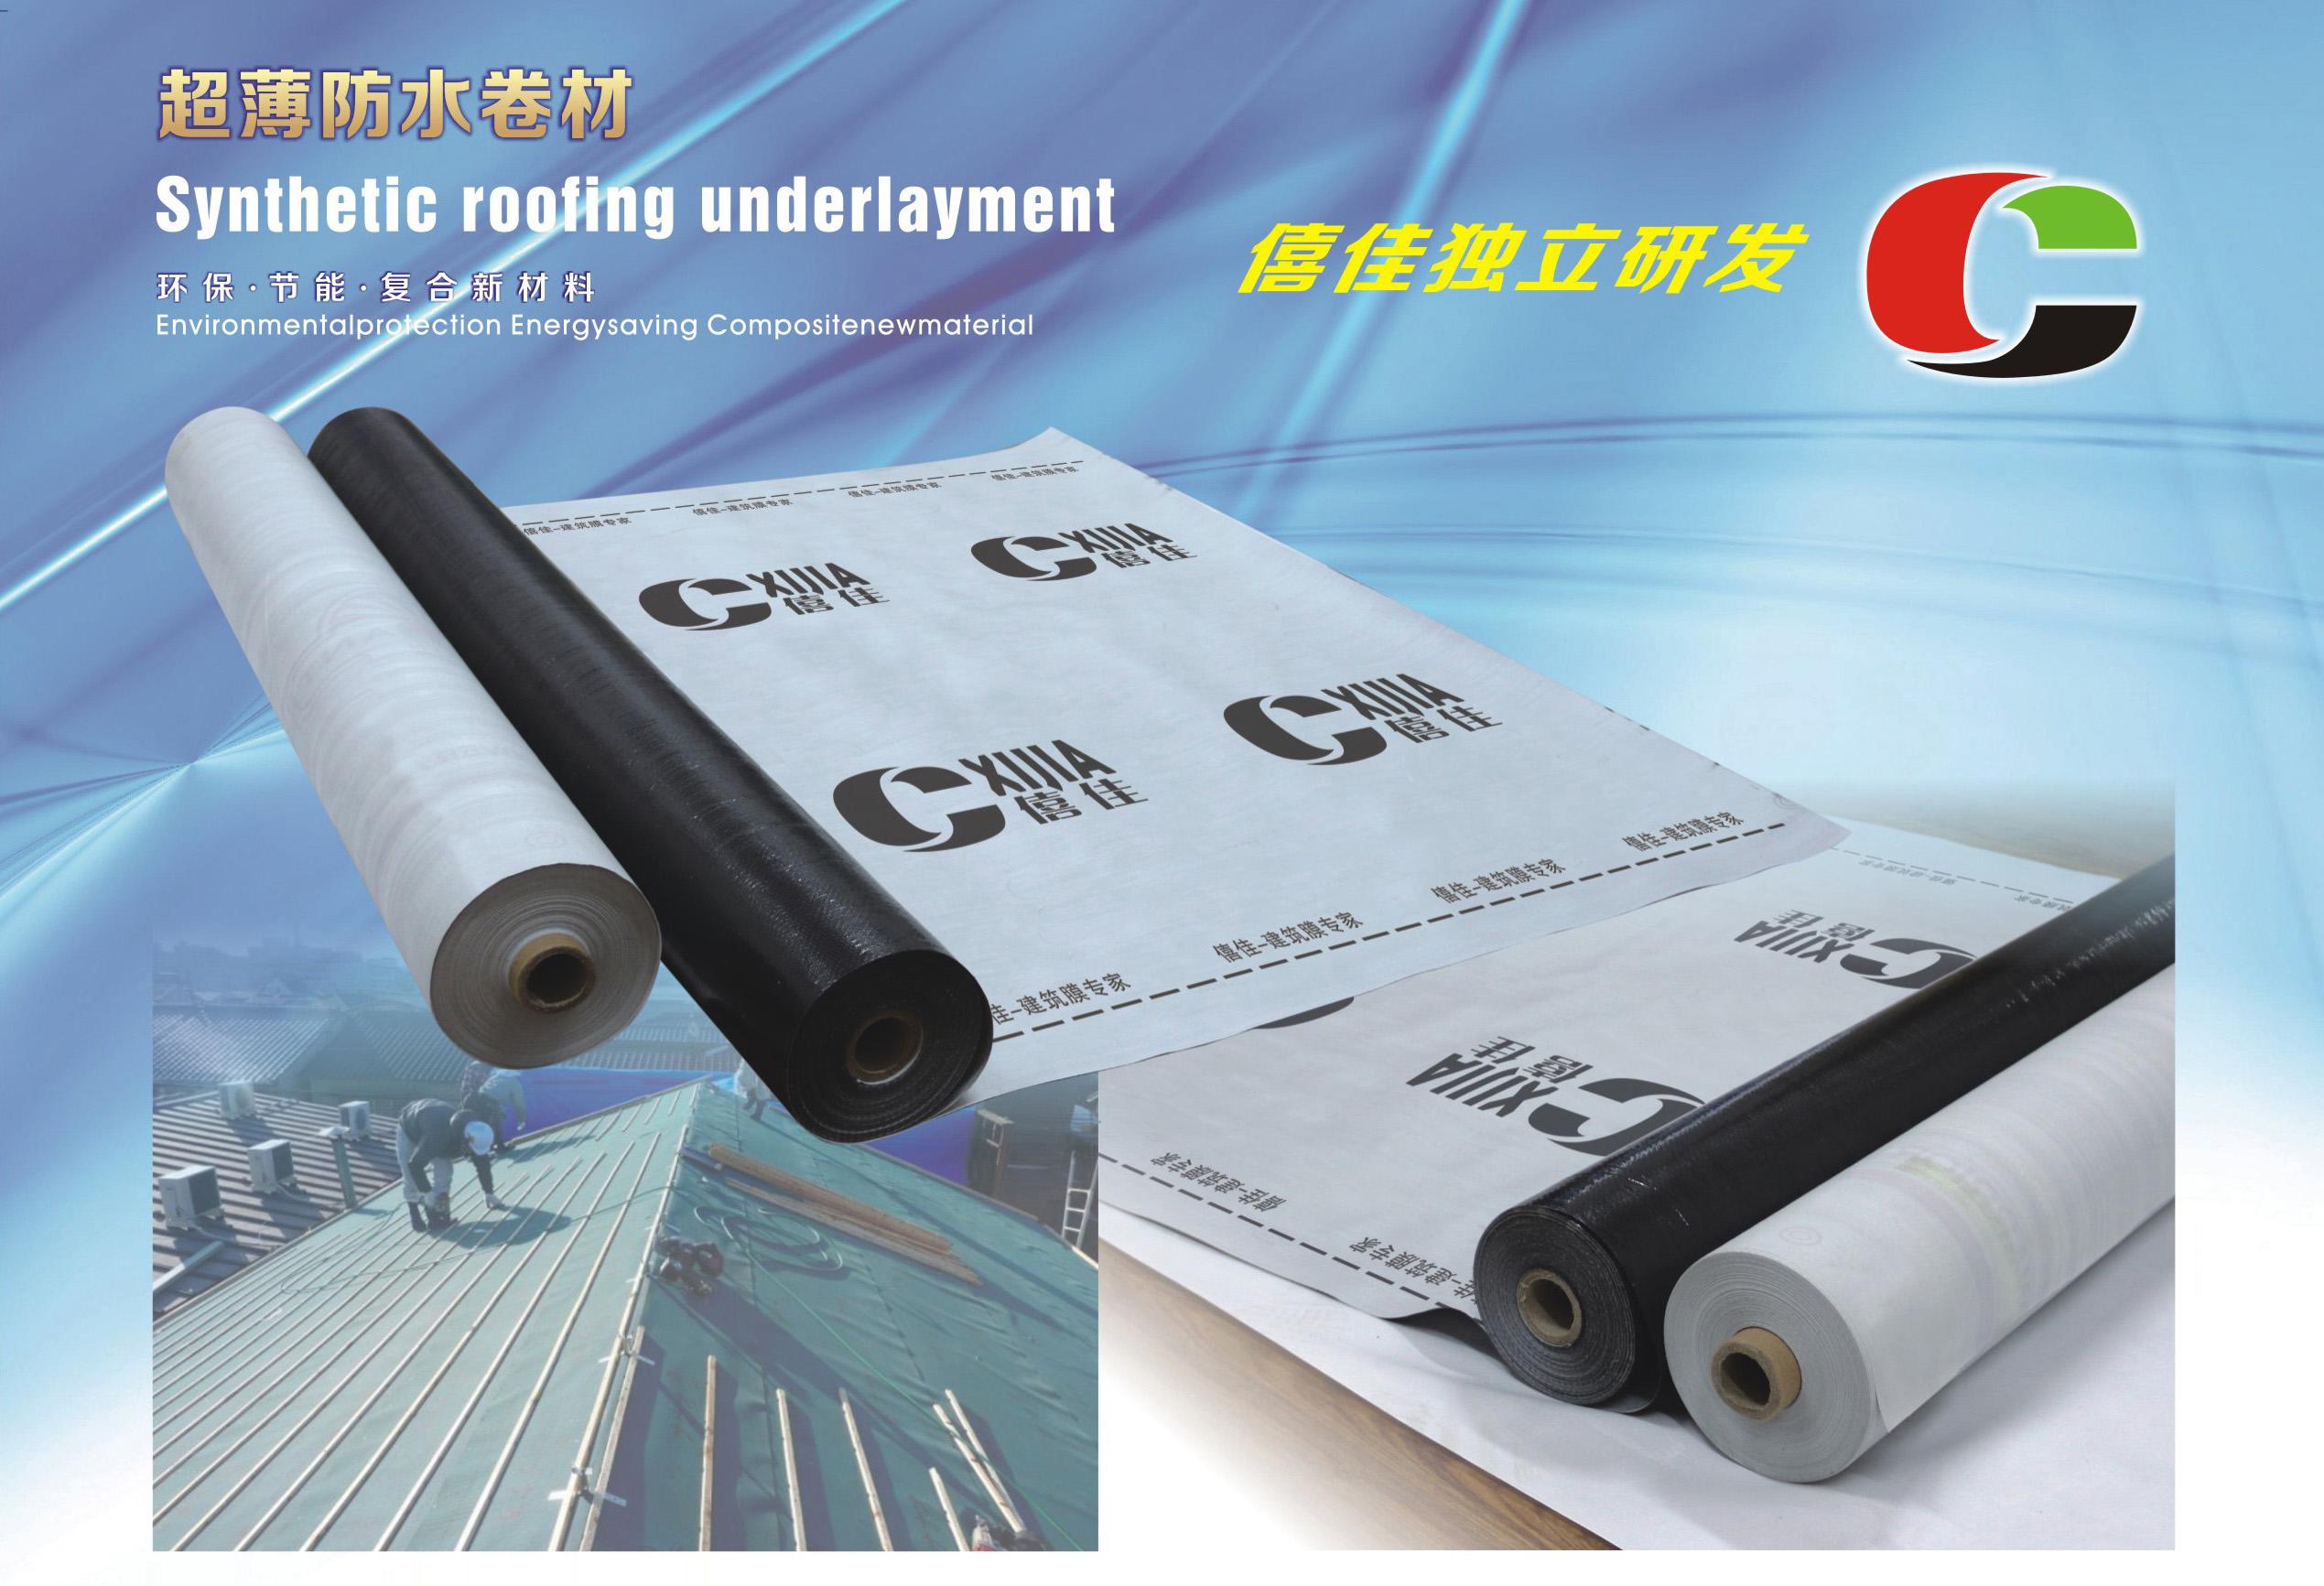 Xijia Group Ltd